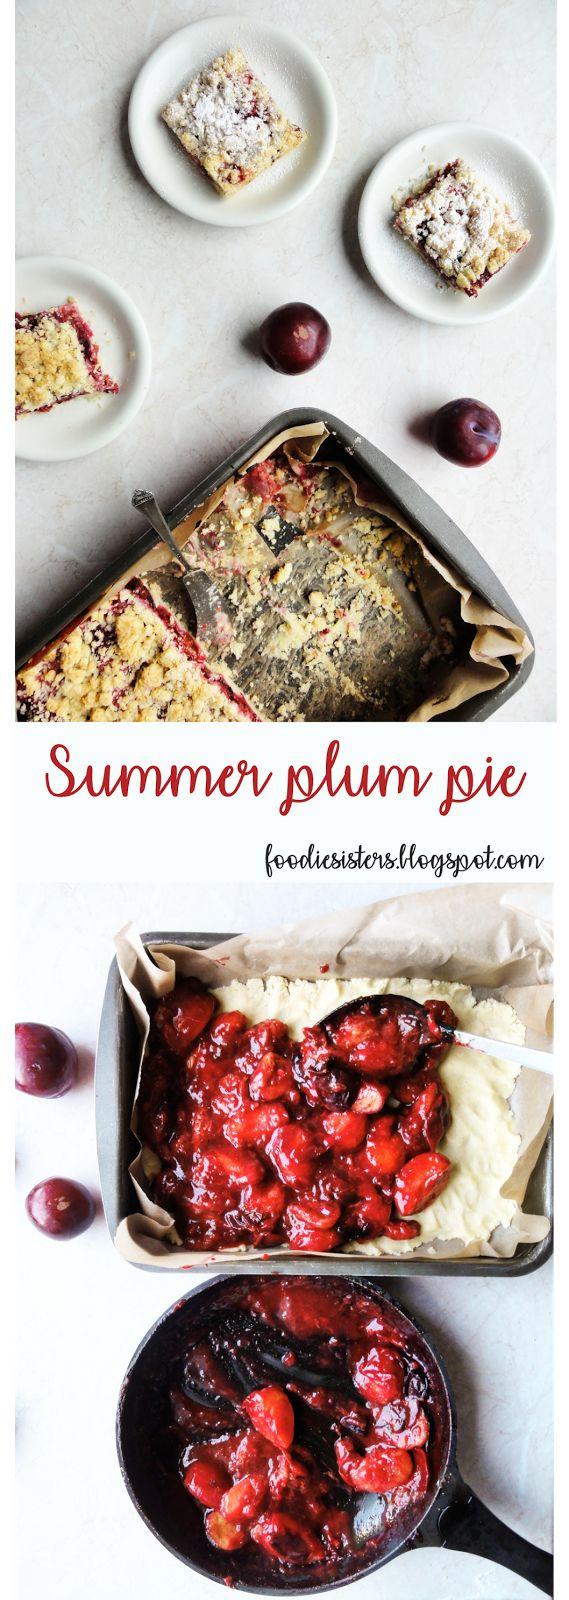 Summer plum pie recipe with cardamom, orange zest and cinnamon.